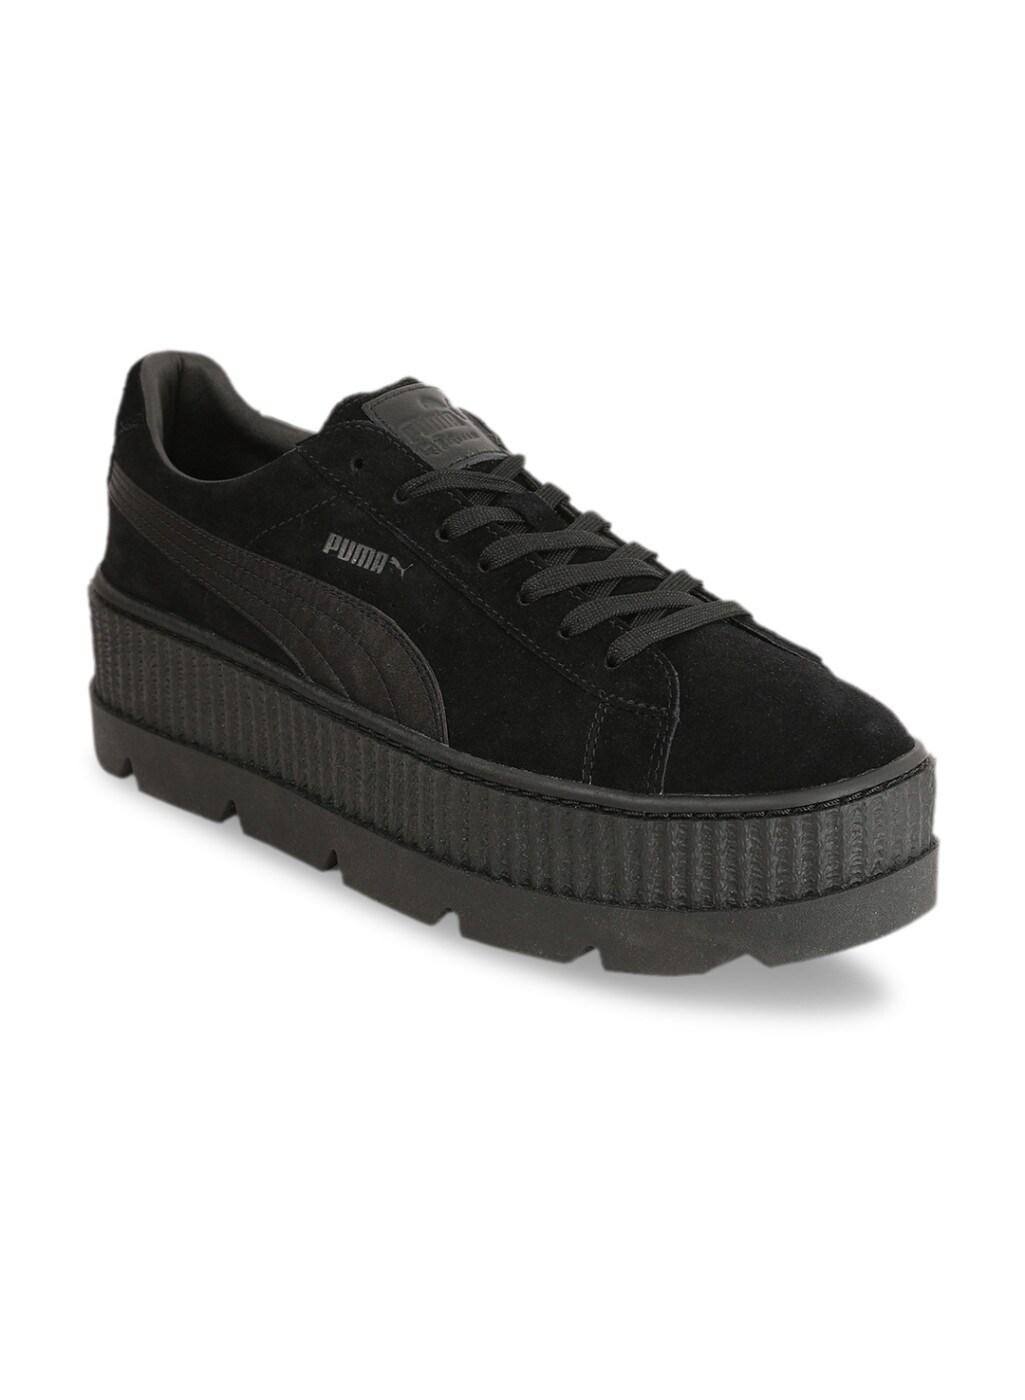 super popular 1de07 8d824 Puma Black Cleated Creeper Suede Sneakers